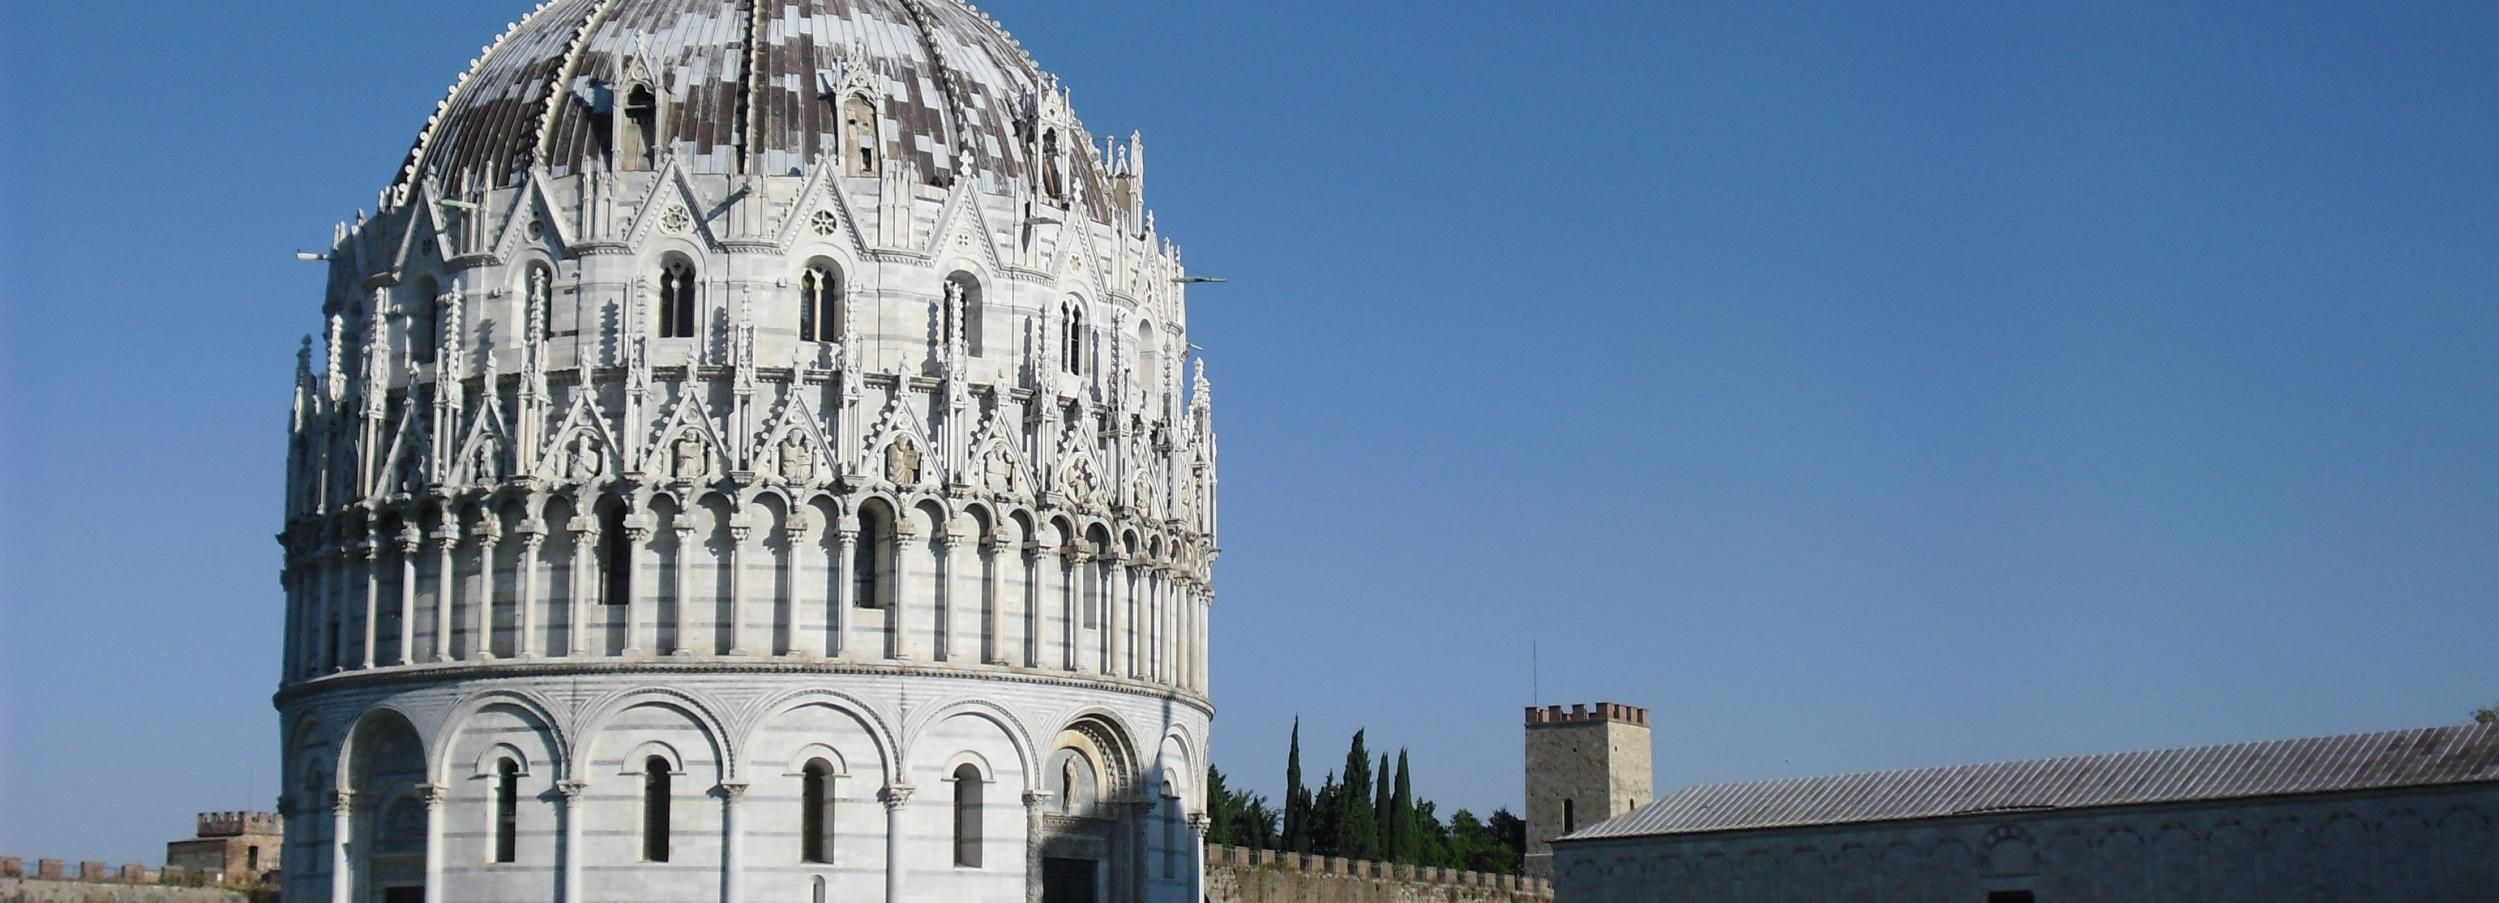 Livorno Port, Pisa, Florence: Full-Day Shore Excursion